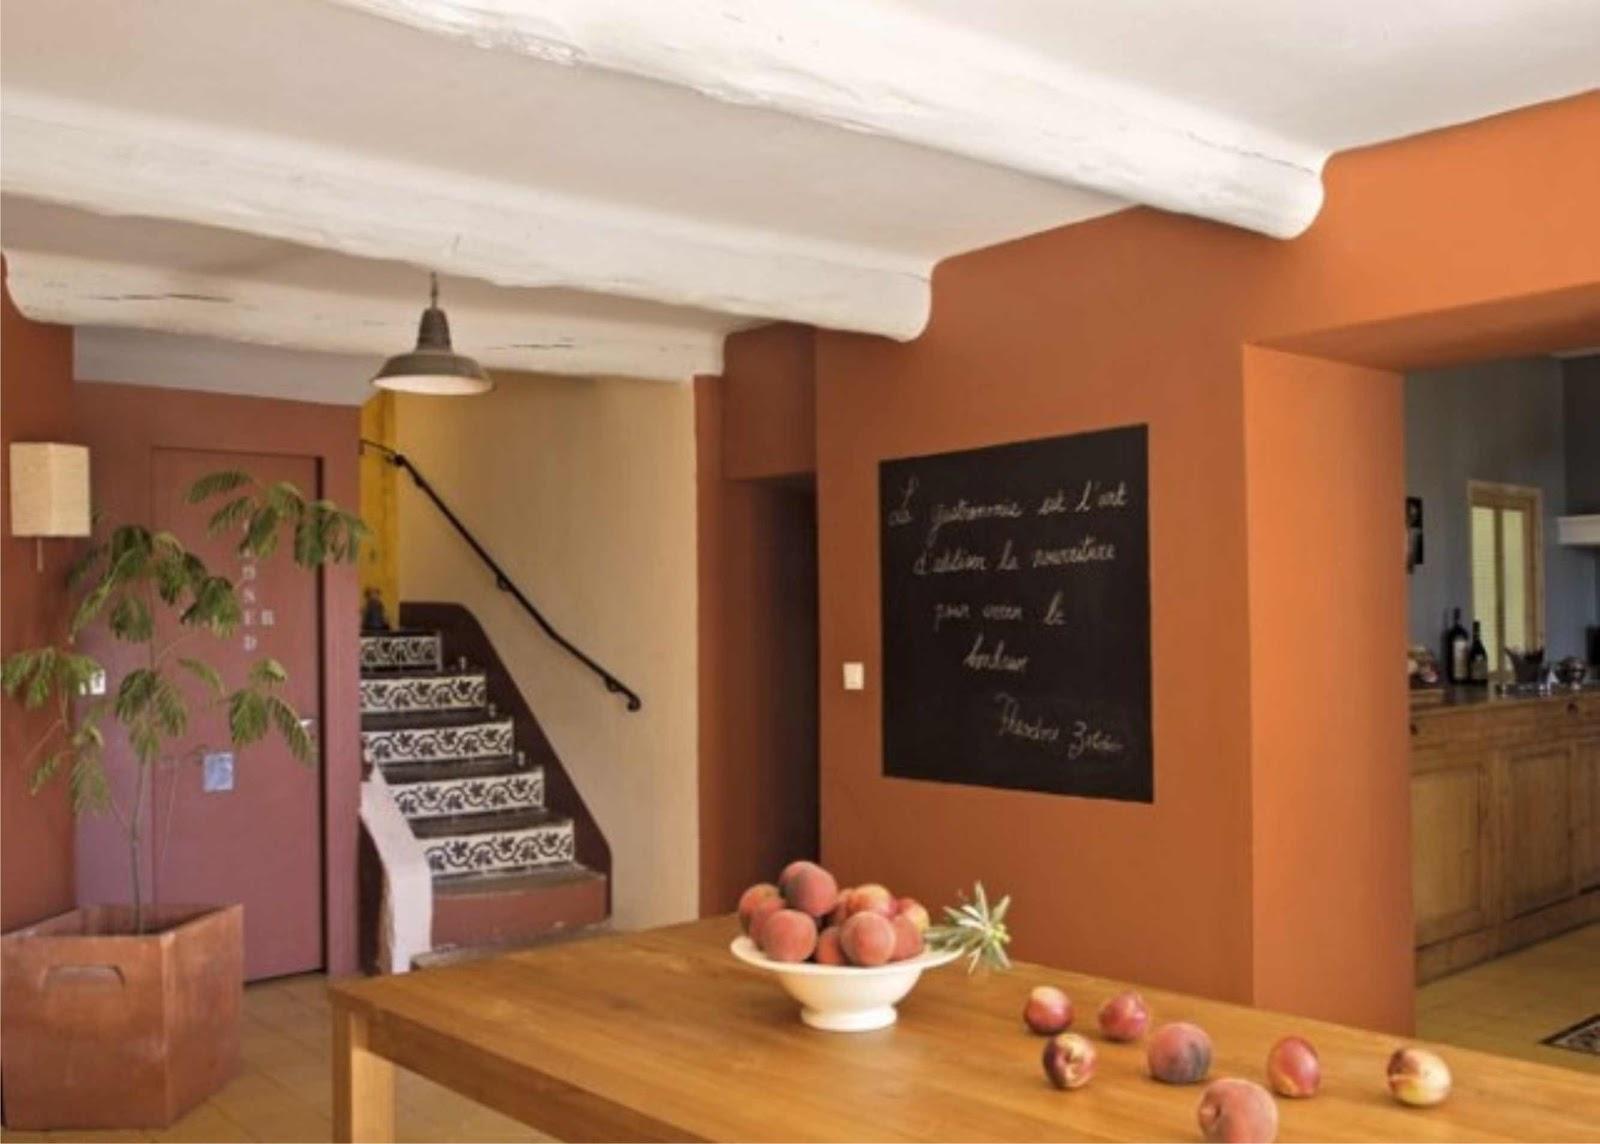 Home una vieja casa provenzal virlova style for Salle a manger orange